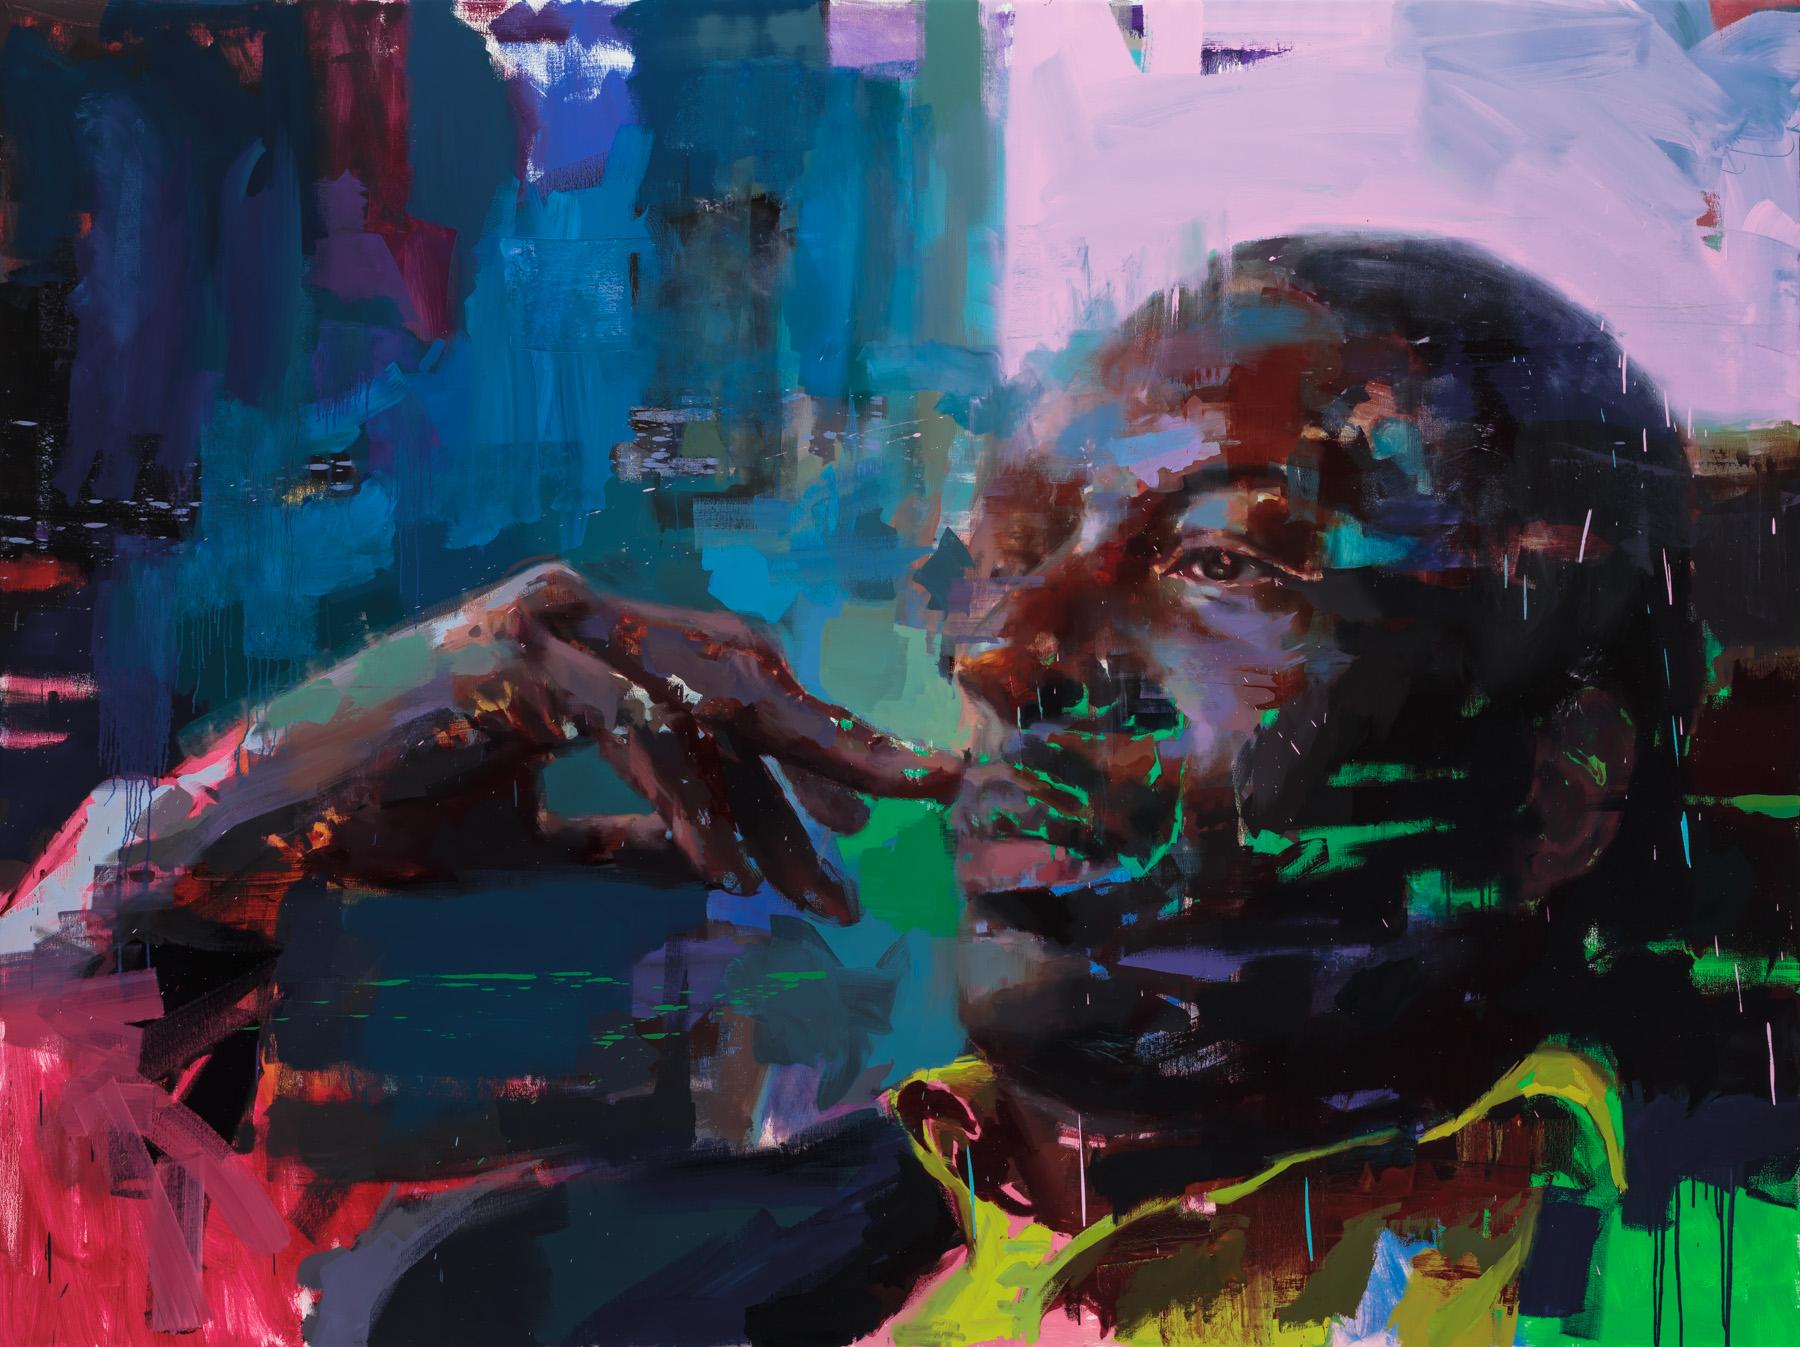 """ On a Misty Night""  Coltrane, 2018, 96"" x 72"" (244 x 183 cm), oil on linen."